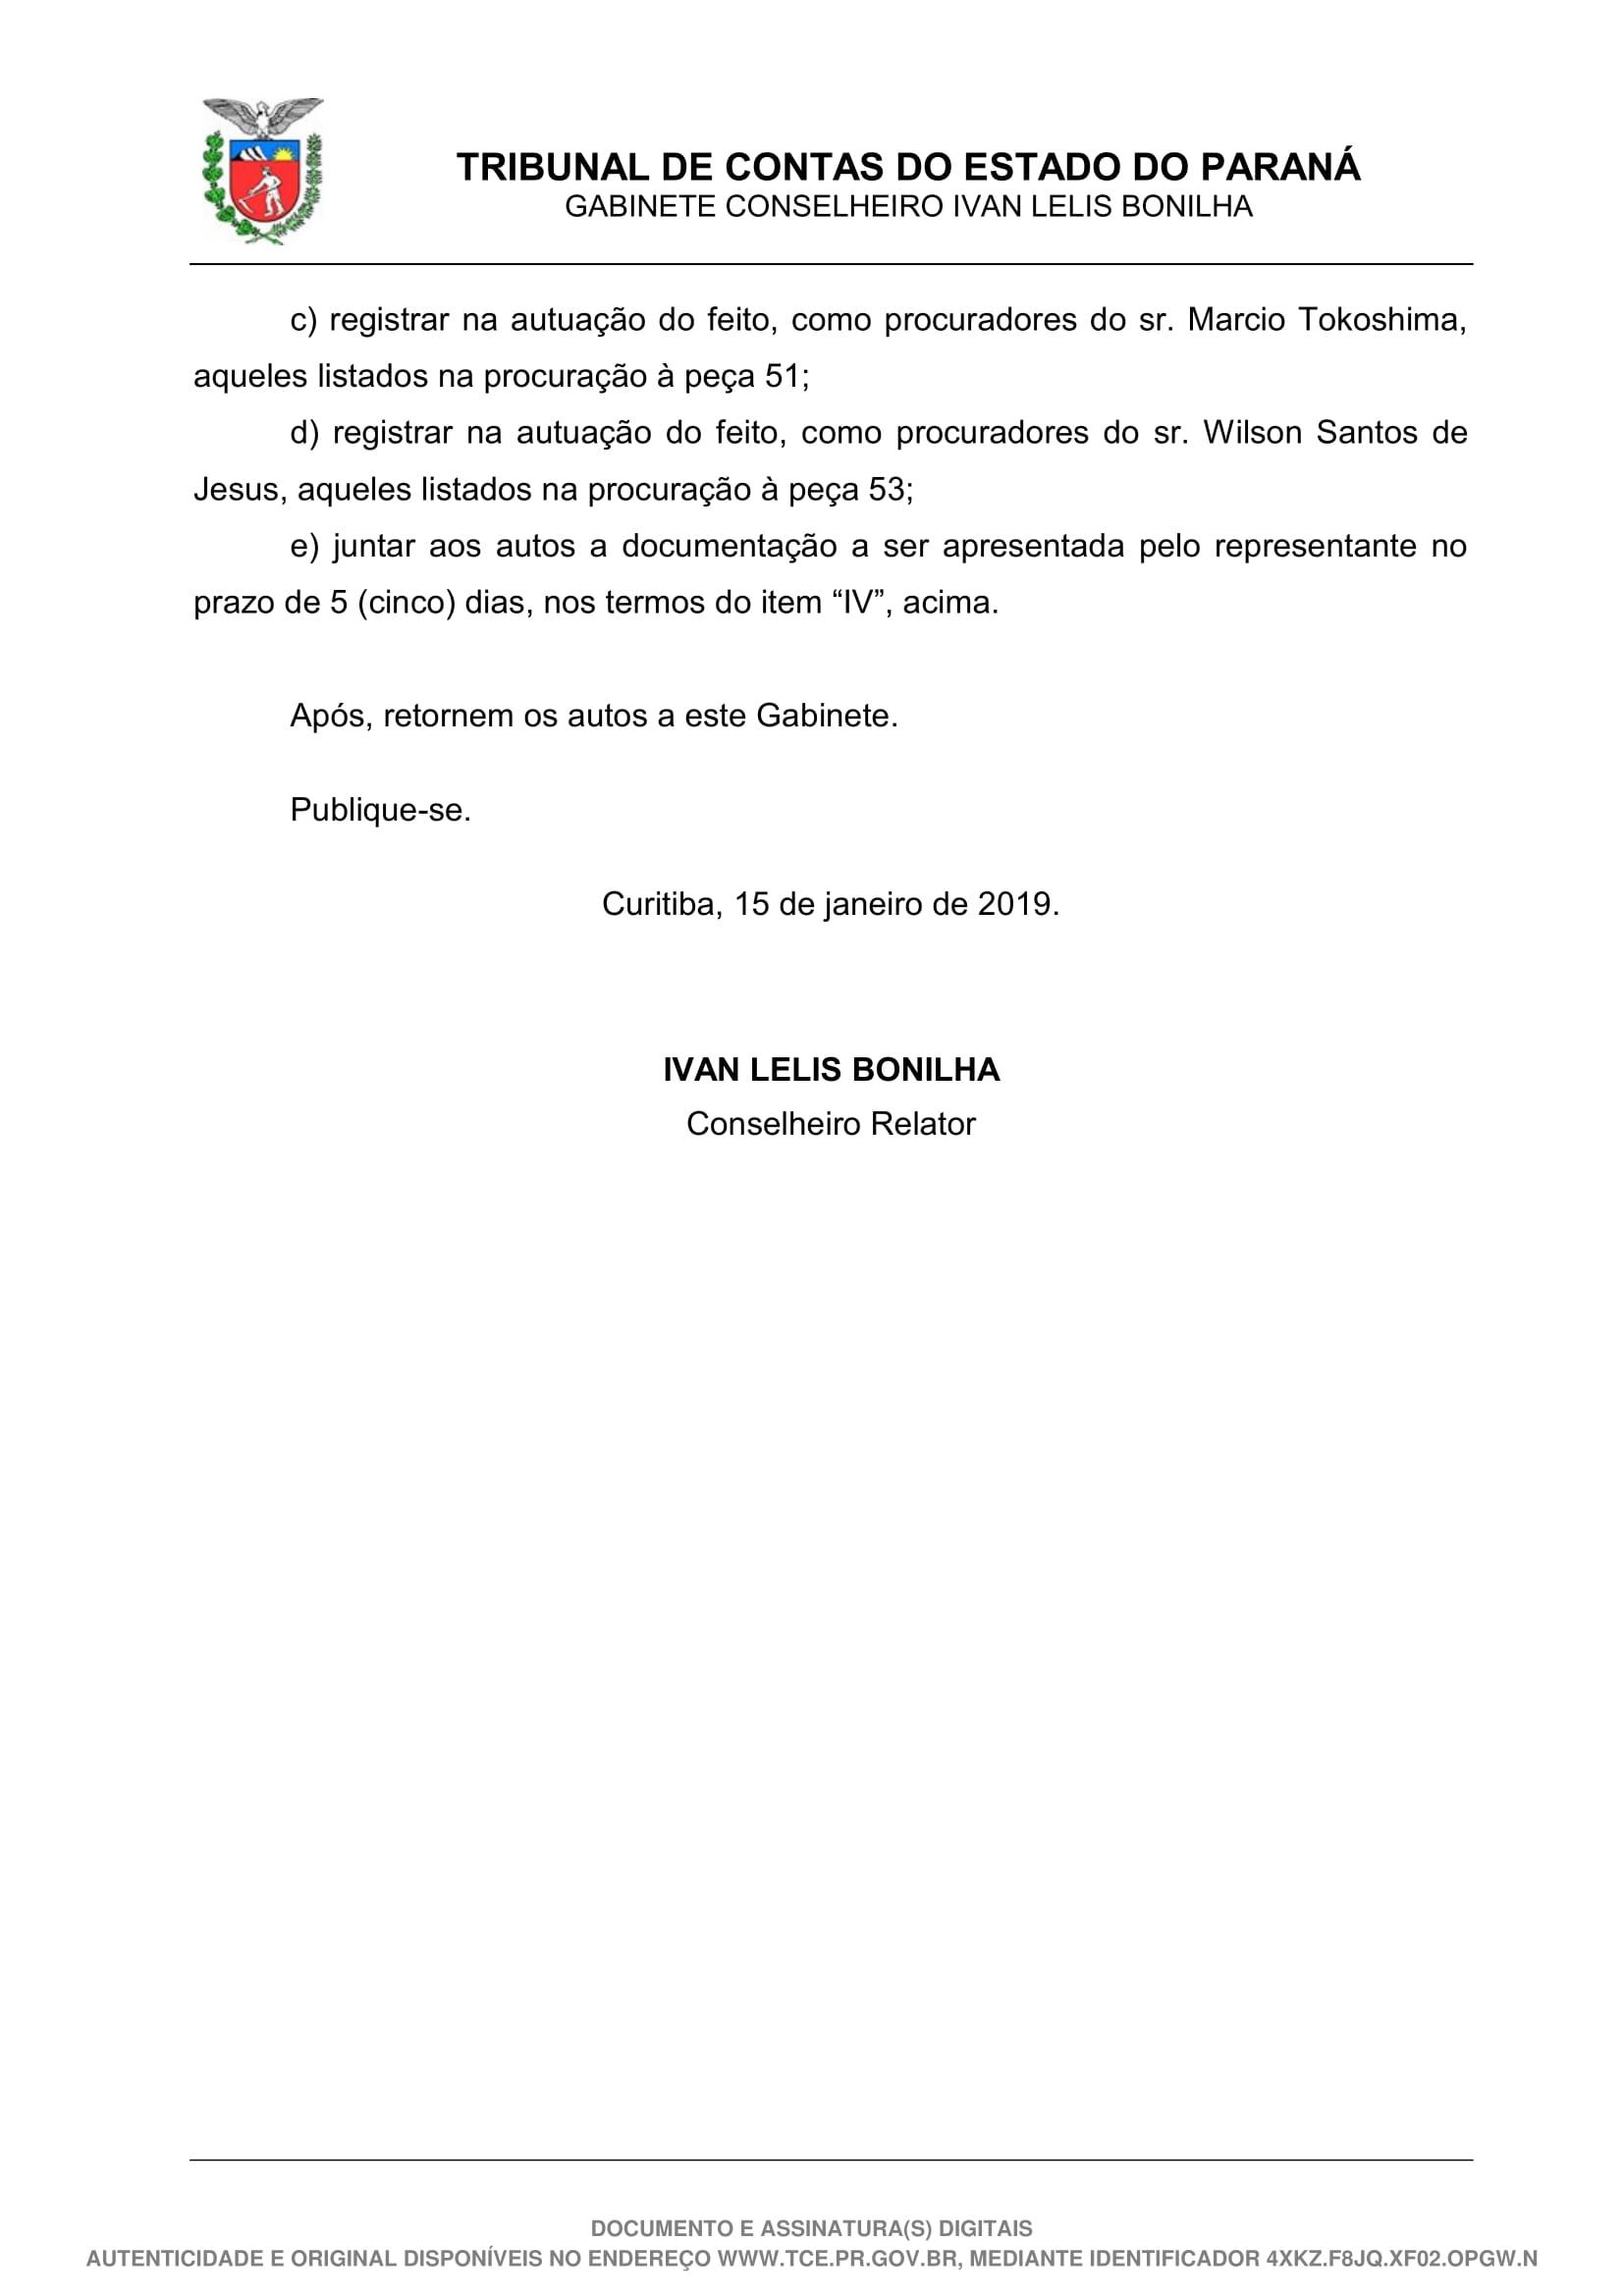 Despacho - 49-19 - GCILB-25